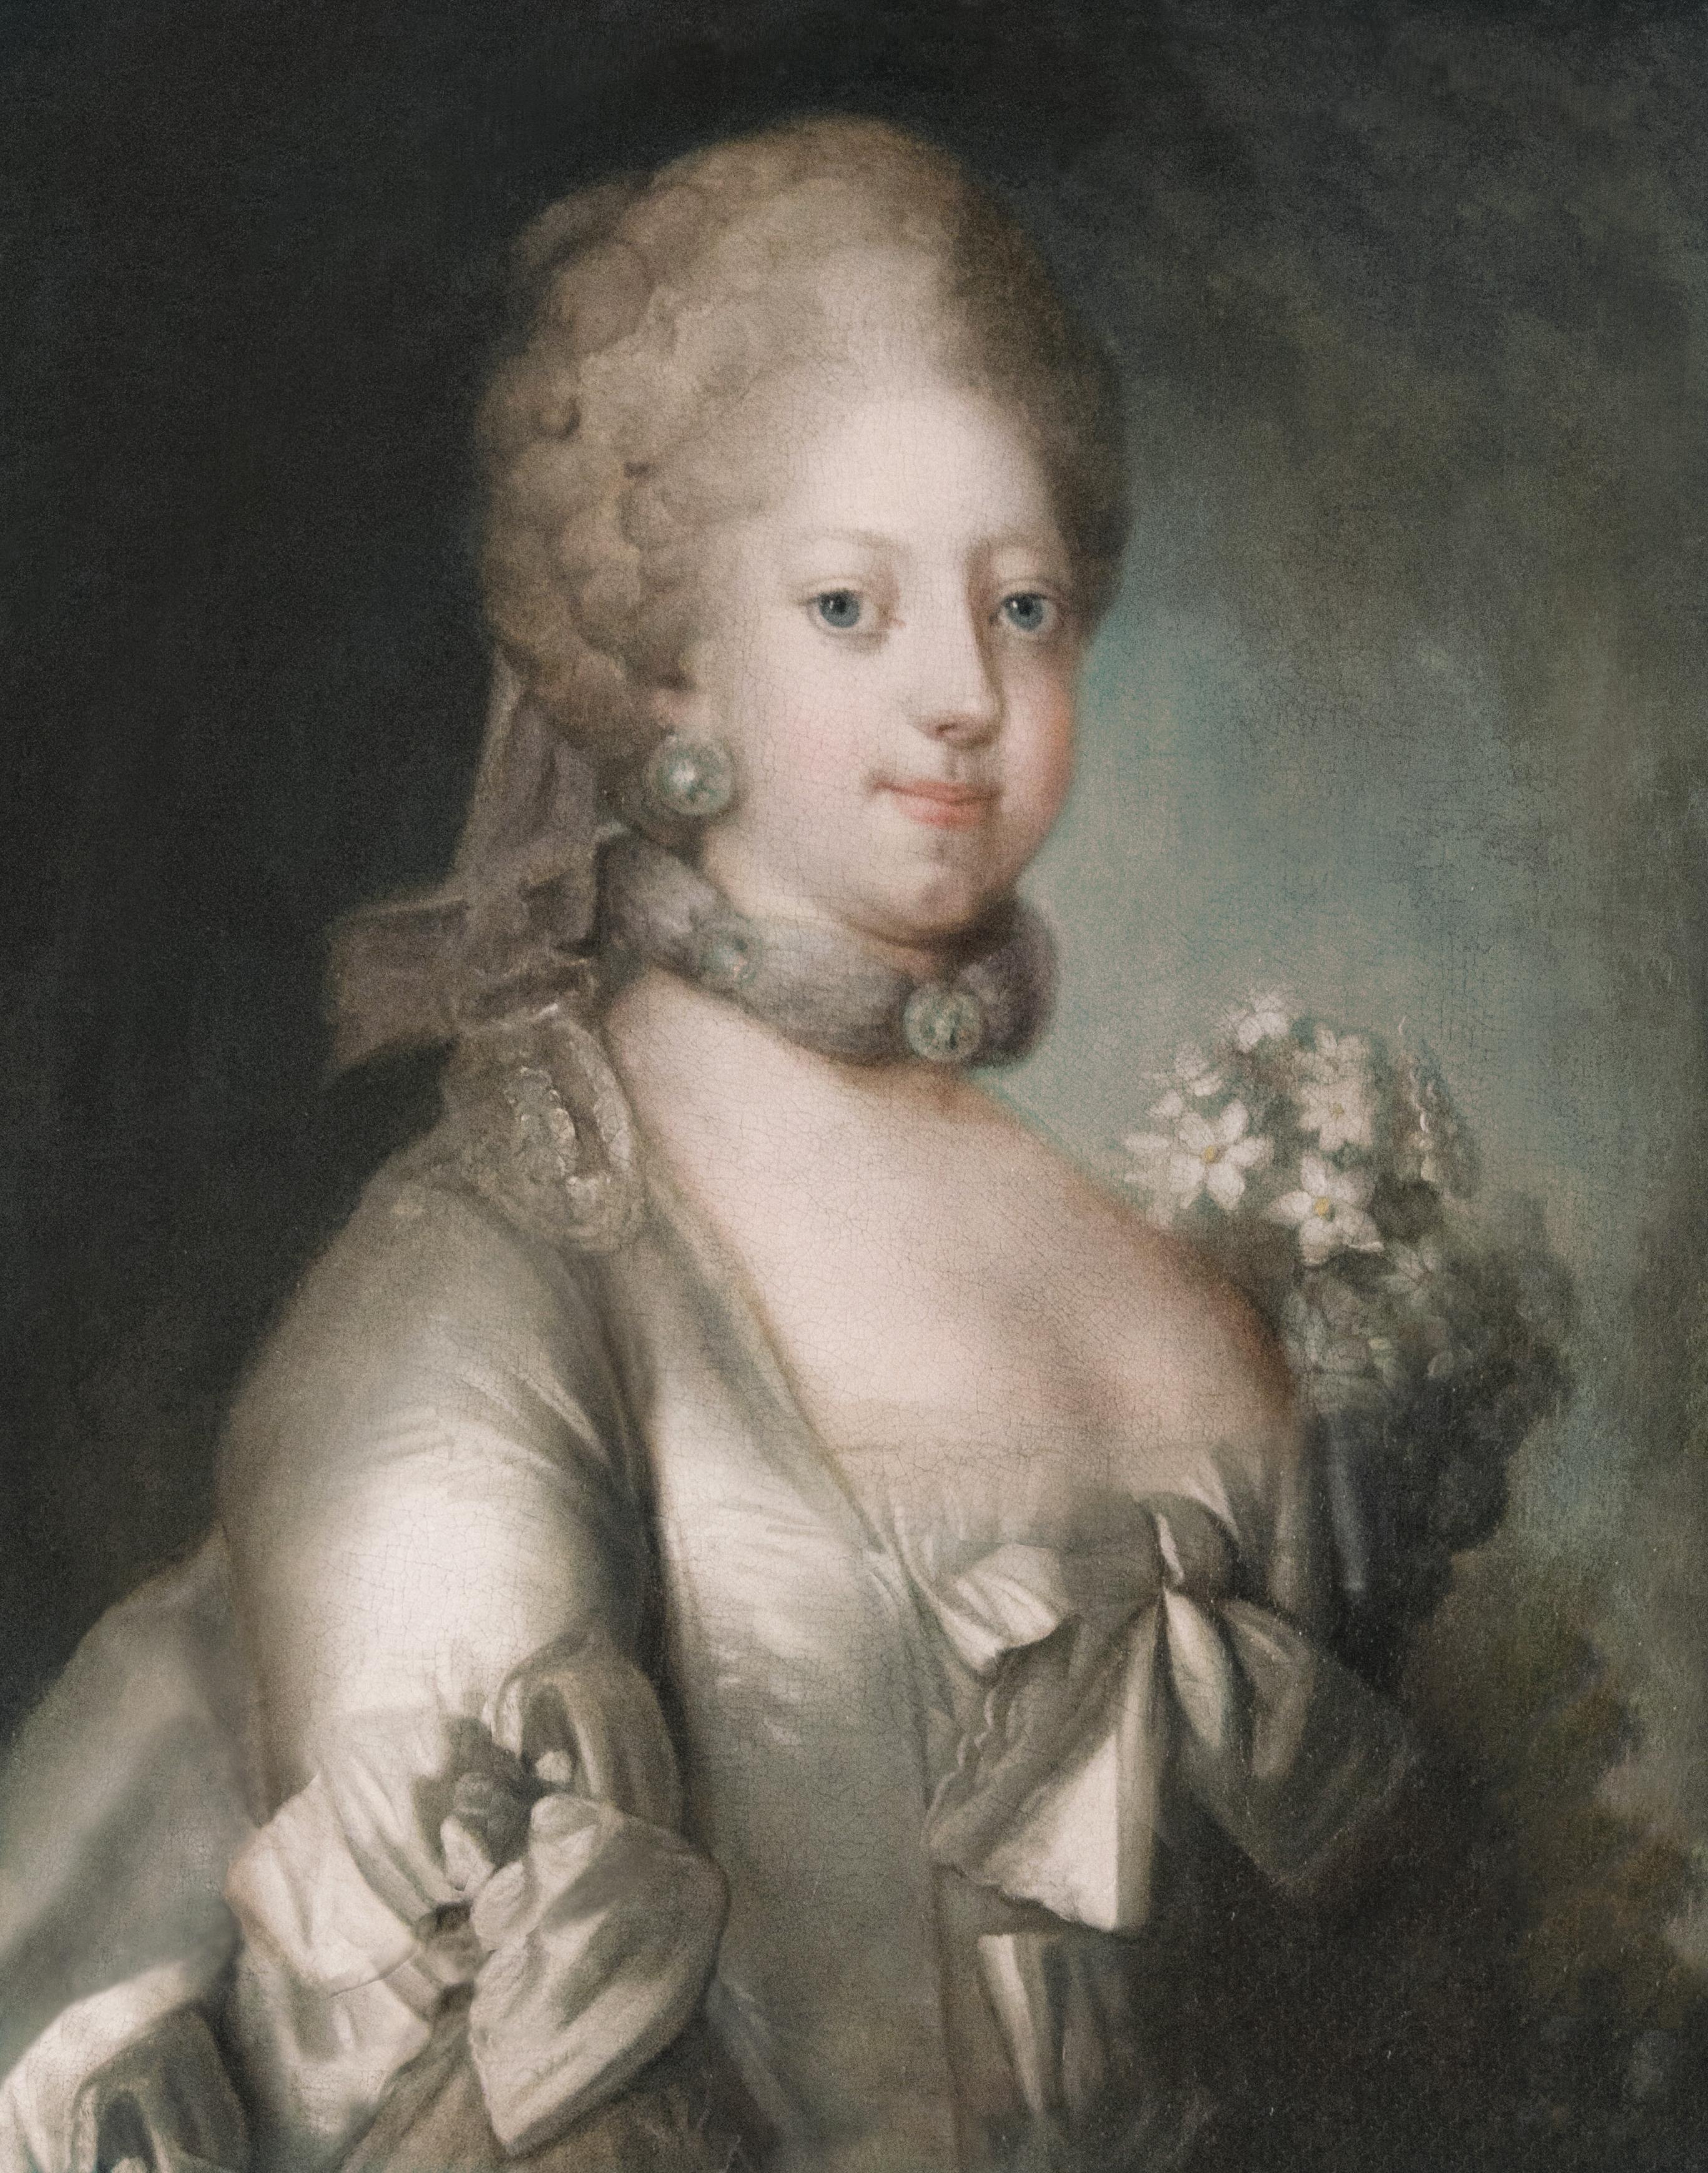 File:Dronning Caroline Mathilde 2.jpg - Wikimedia Commons